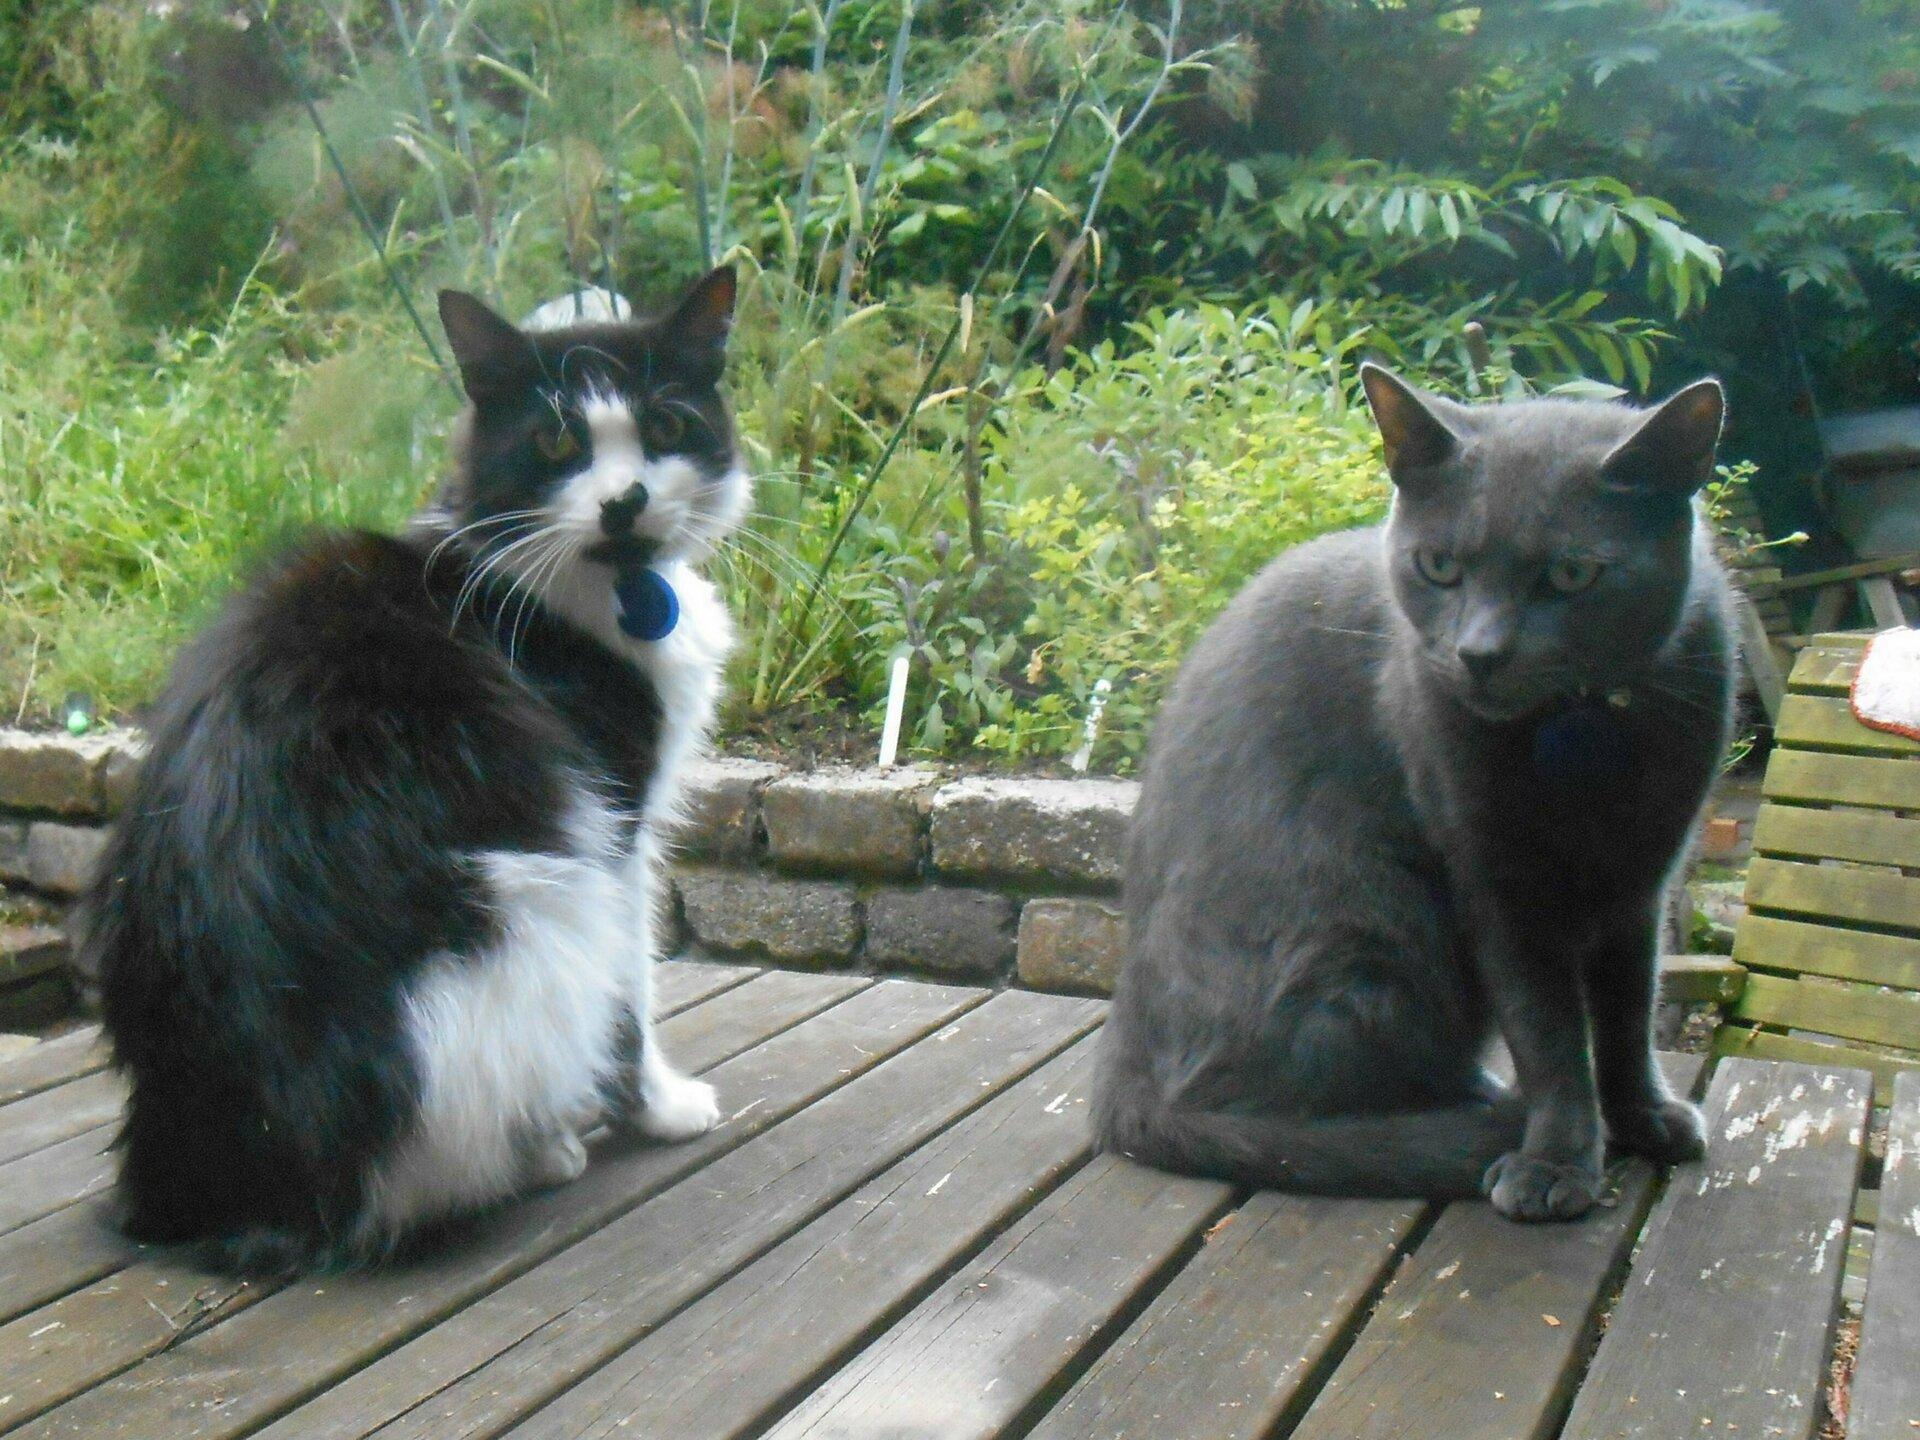 Felis silvestris (domestic cat) 'Willow'